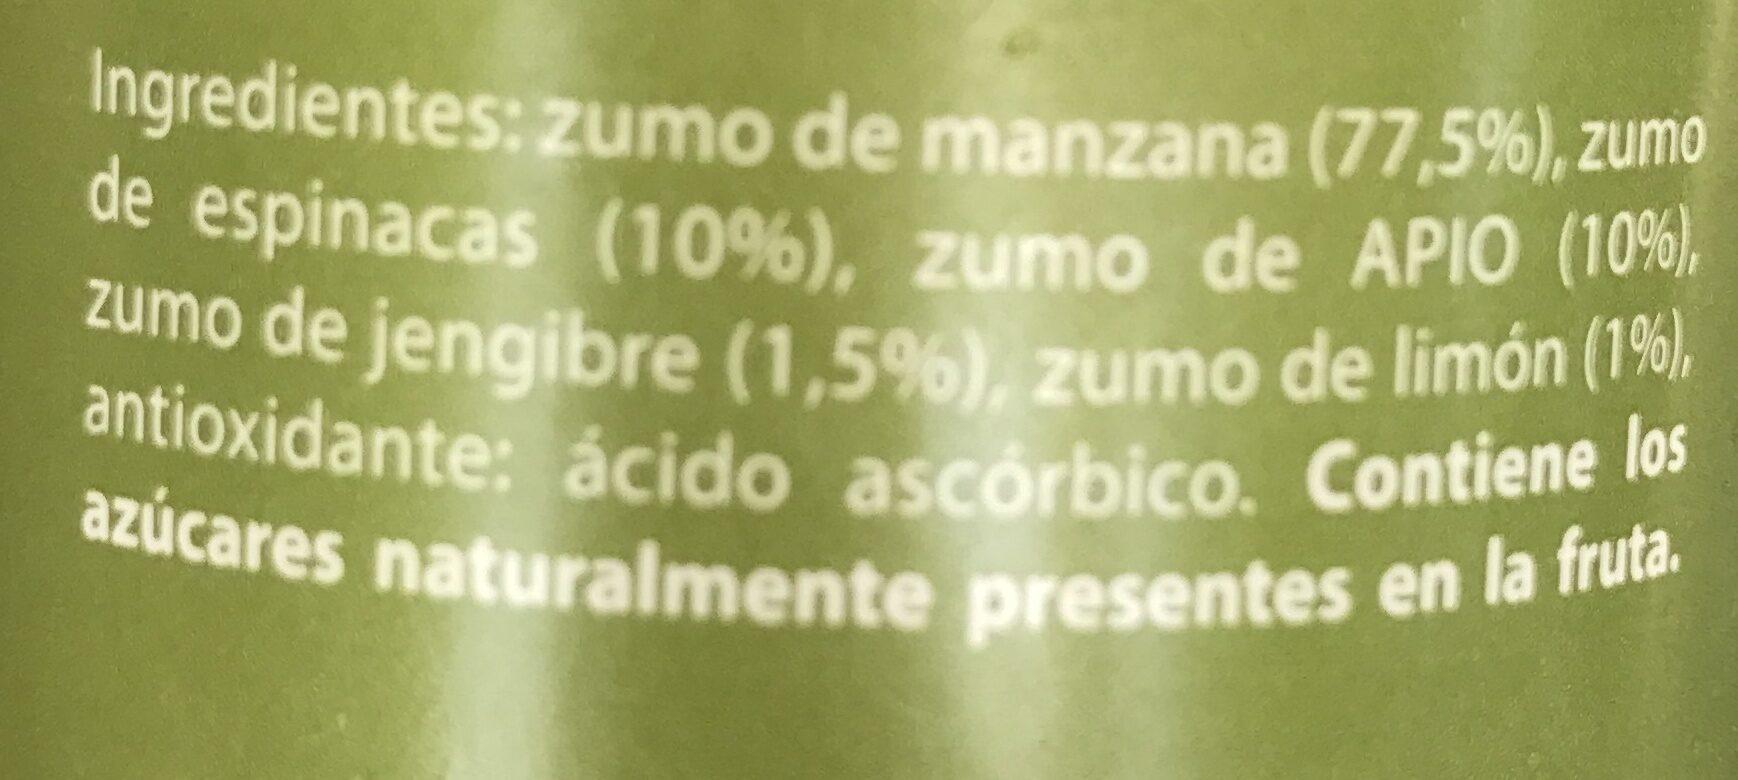 Zumo con jengibre - Ingredientes - es